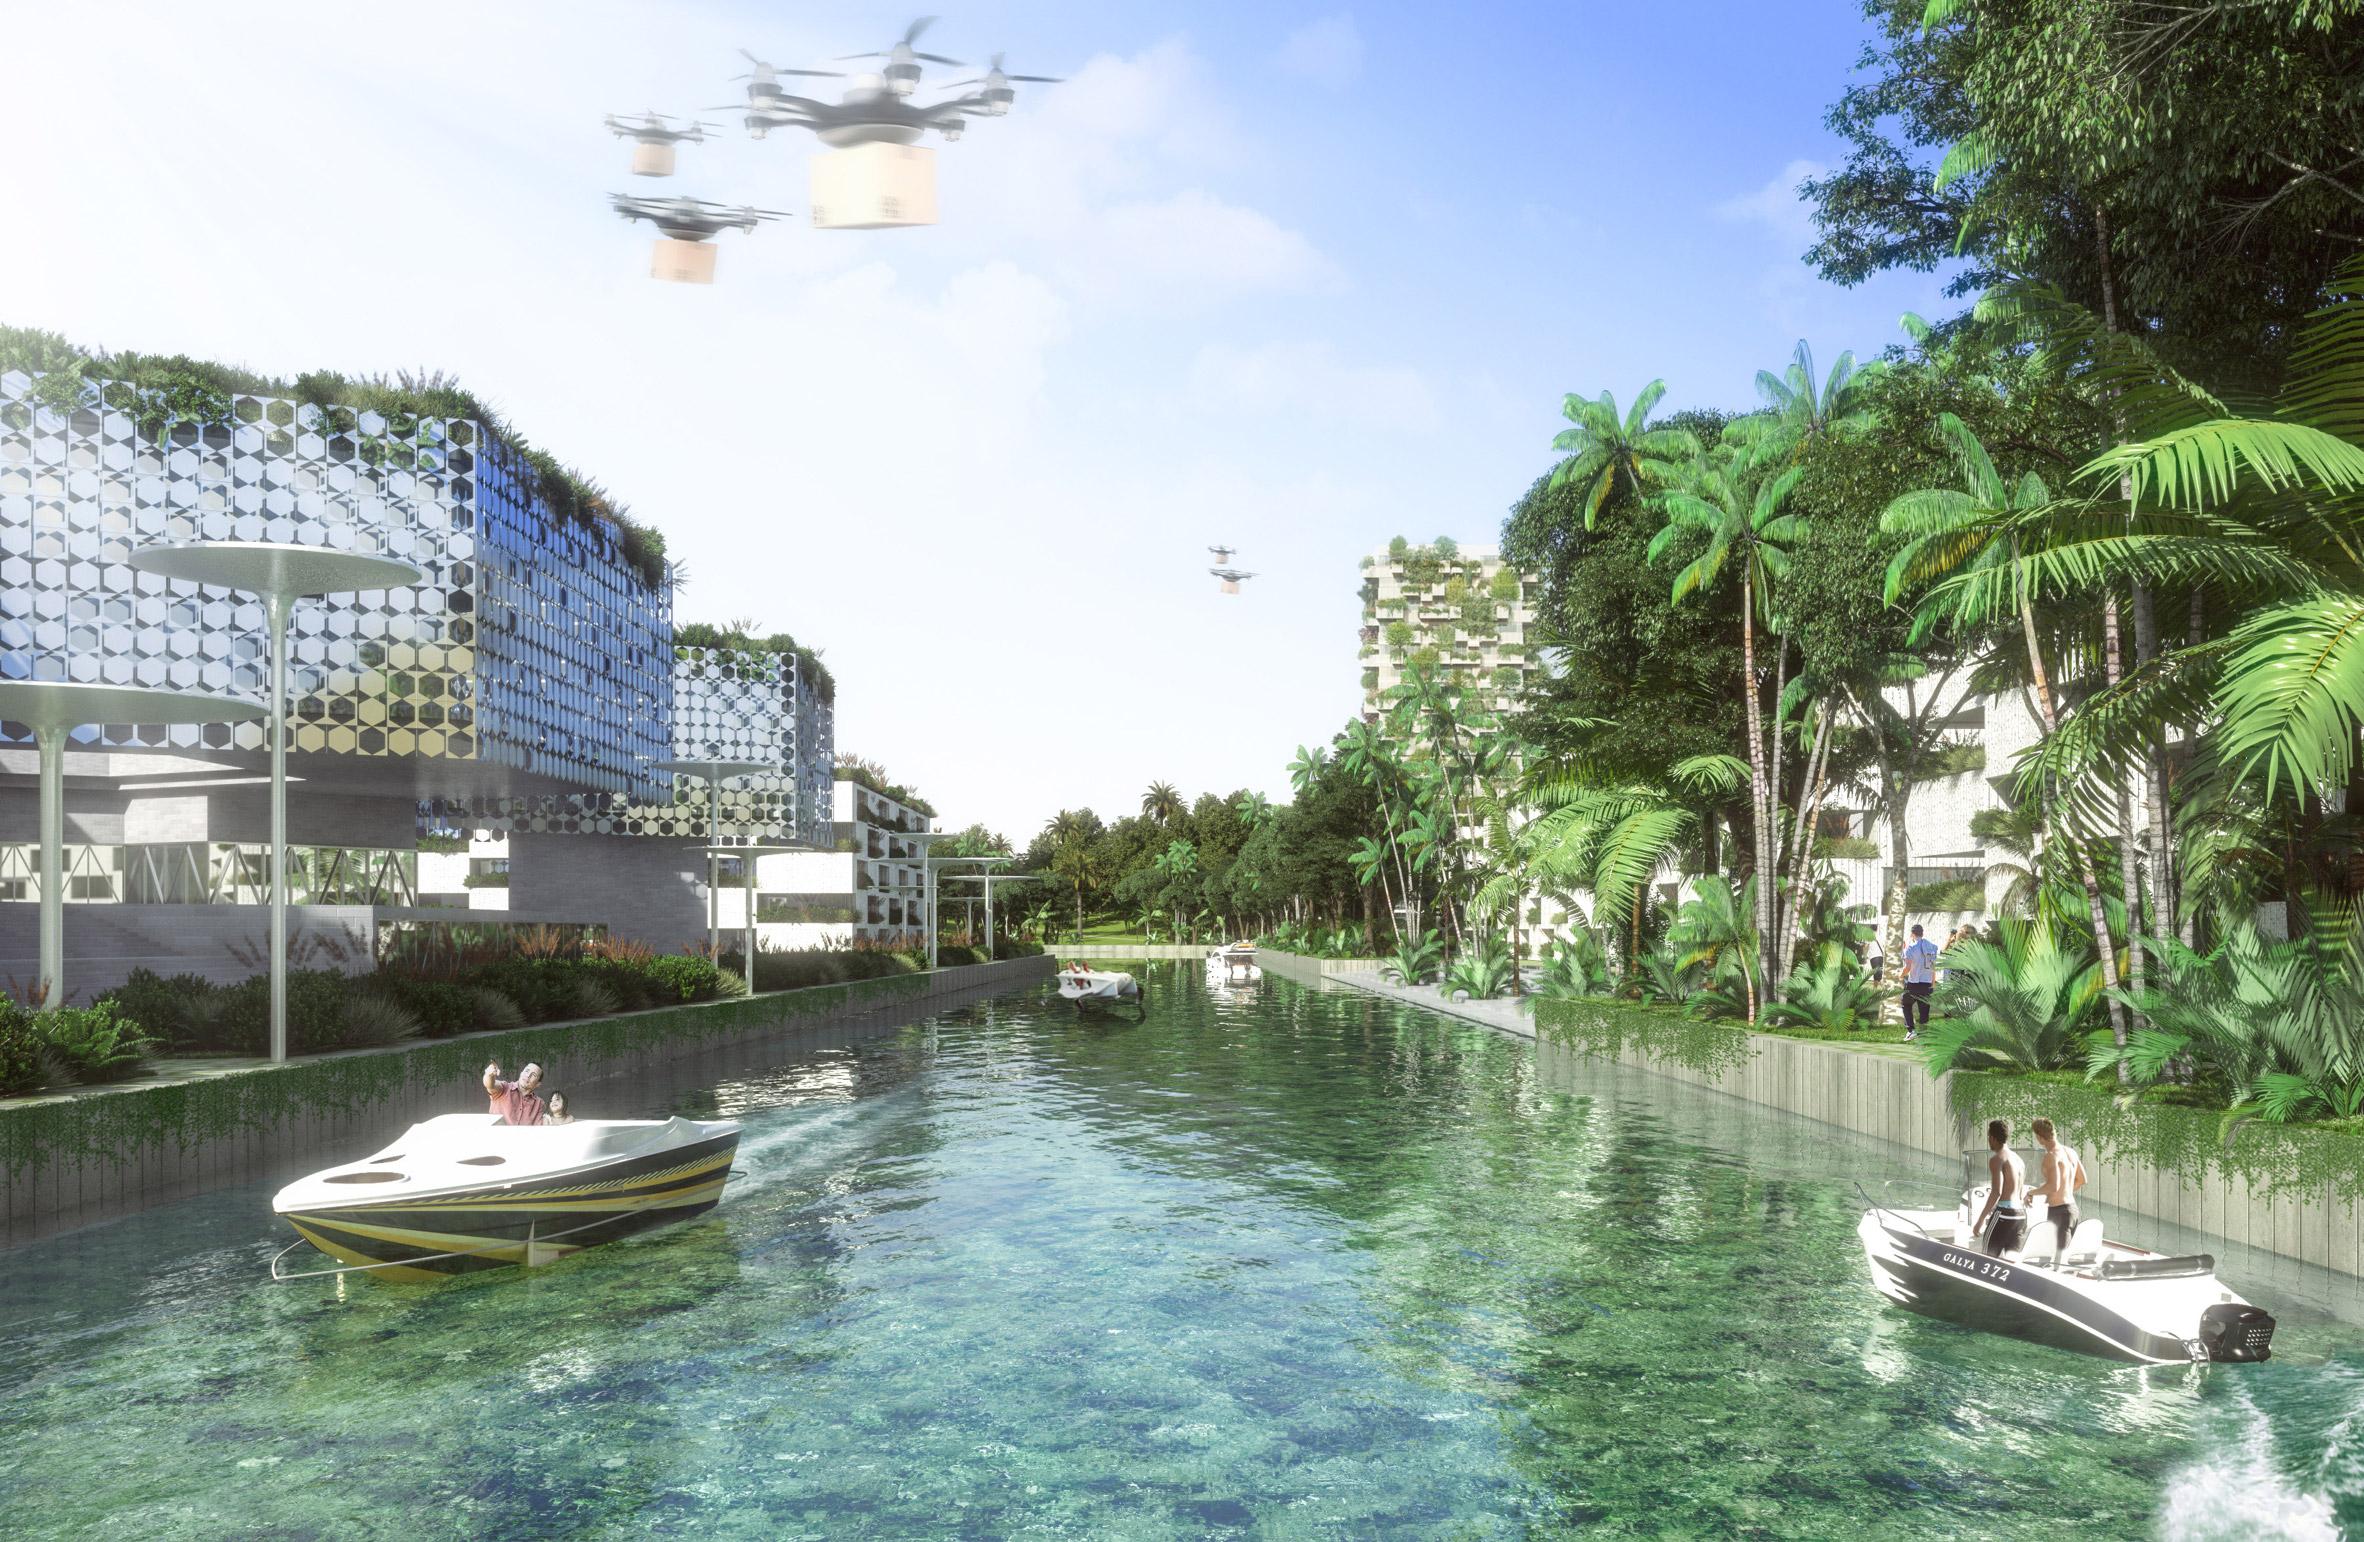 smart forest city, stefano boeri, stad van de toekomst, goren, mexico, cancun, architectuur, 4